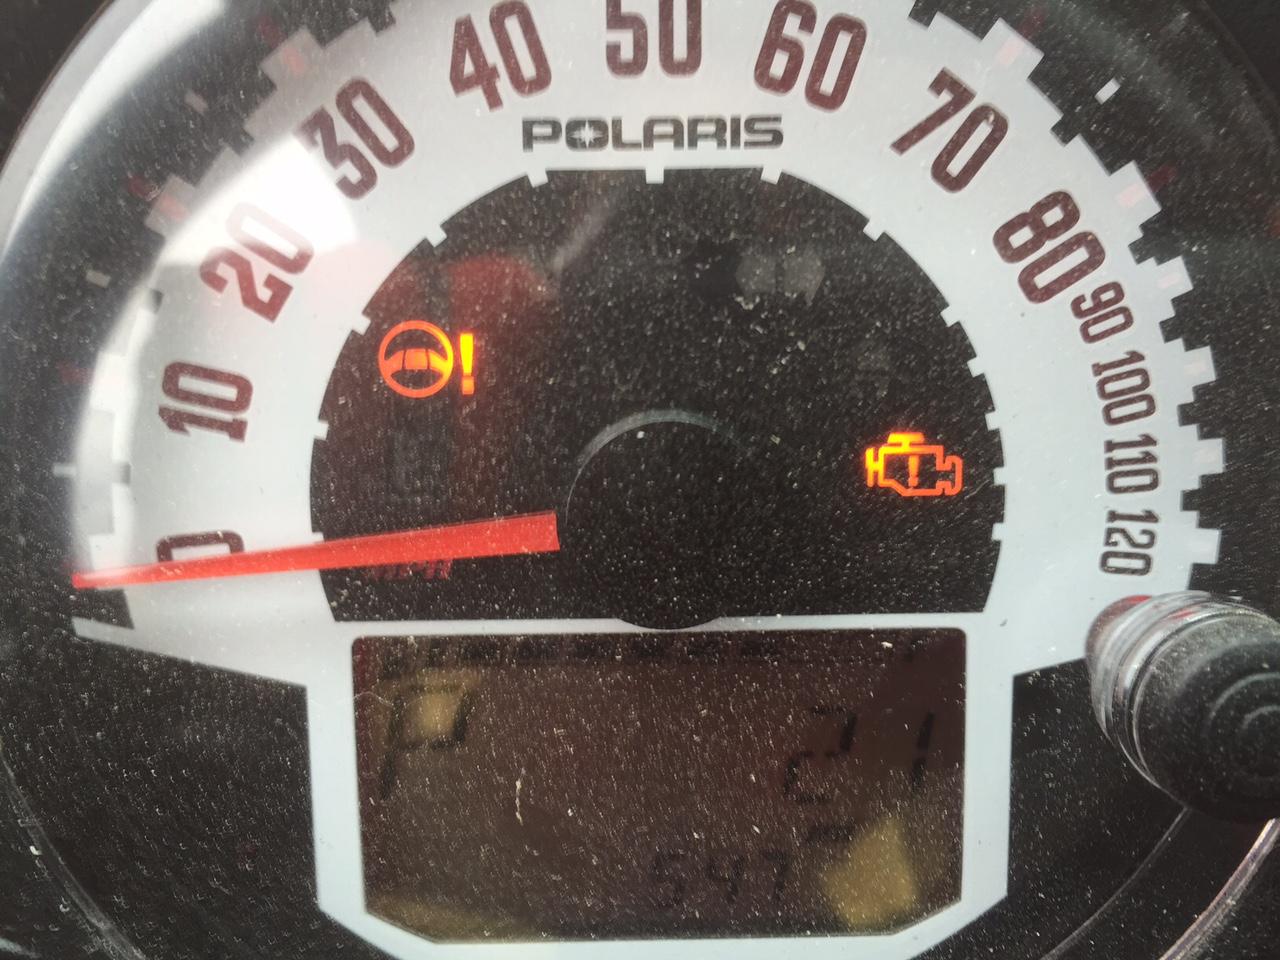 Steering Wheel Light & Check Engine Light Codes